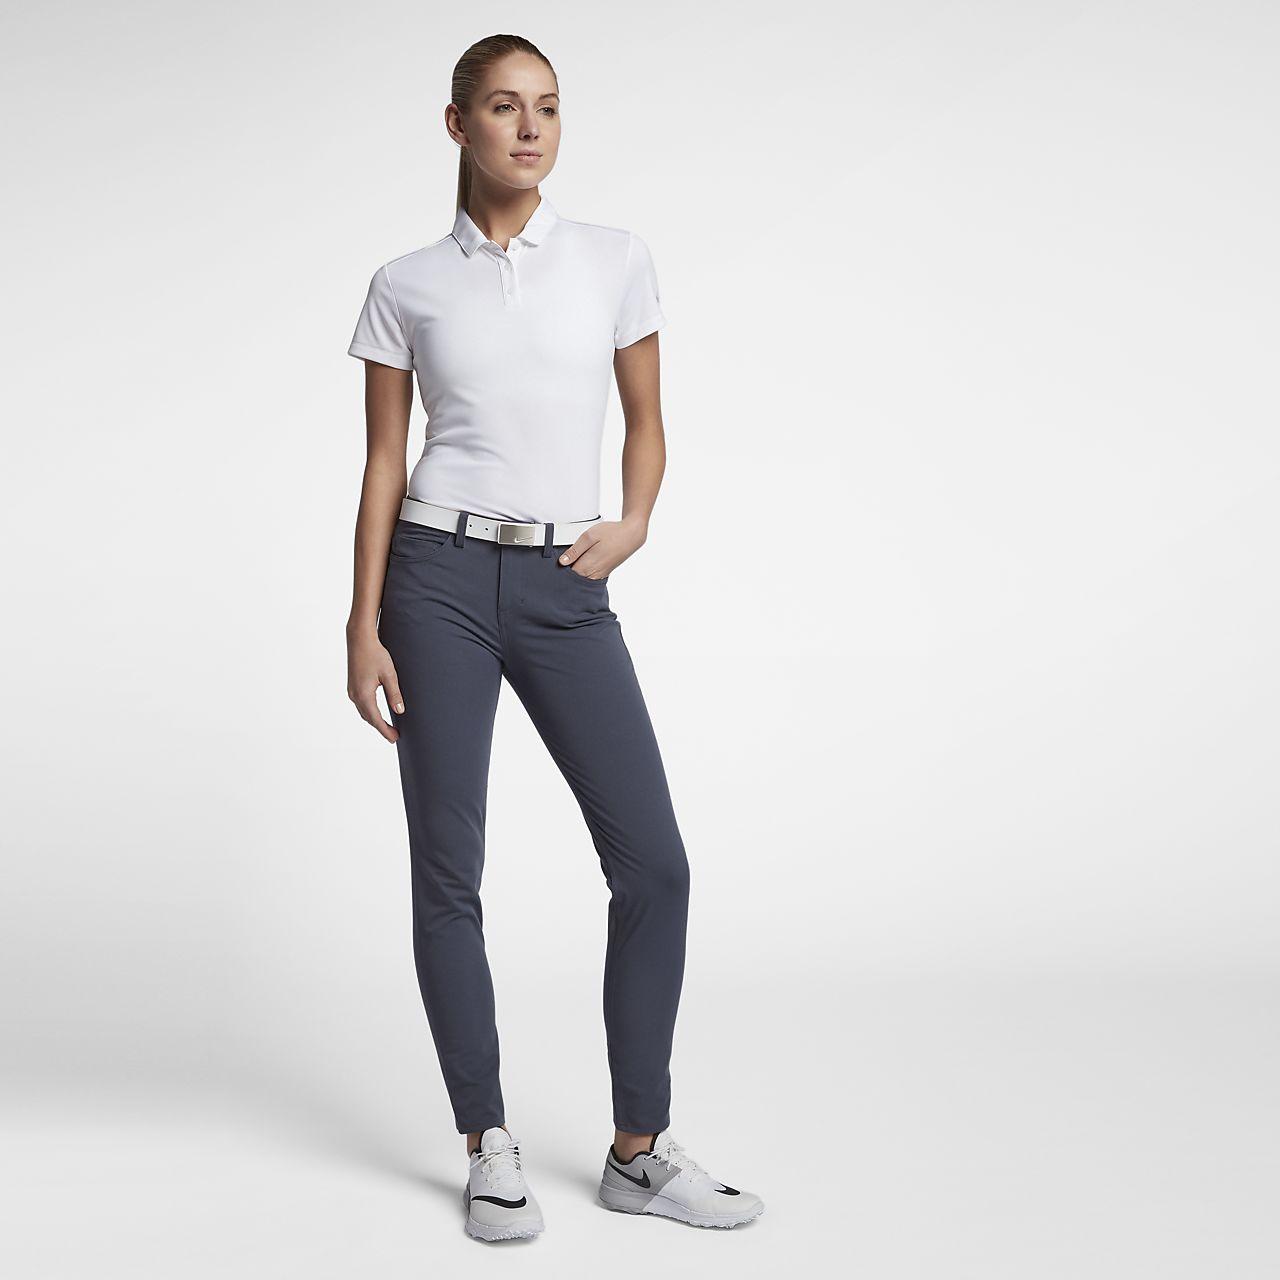 pantalon de golf tiss nike dry pour femme ca. Black Bedroom Furniture Sets. Home Design Ideas